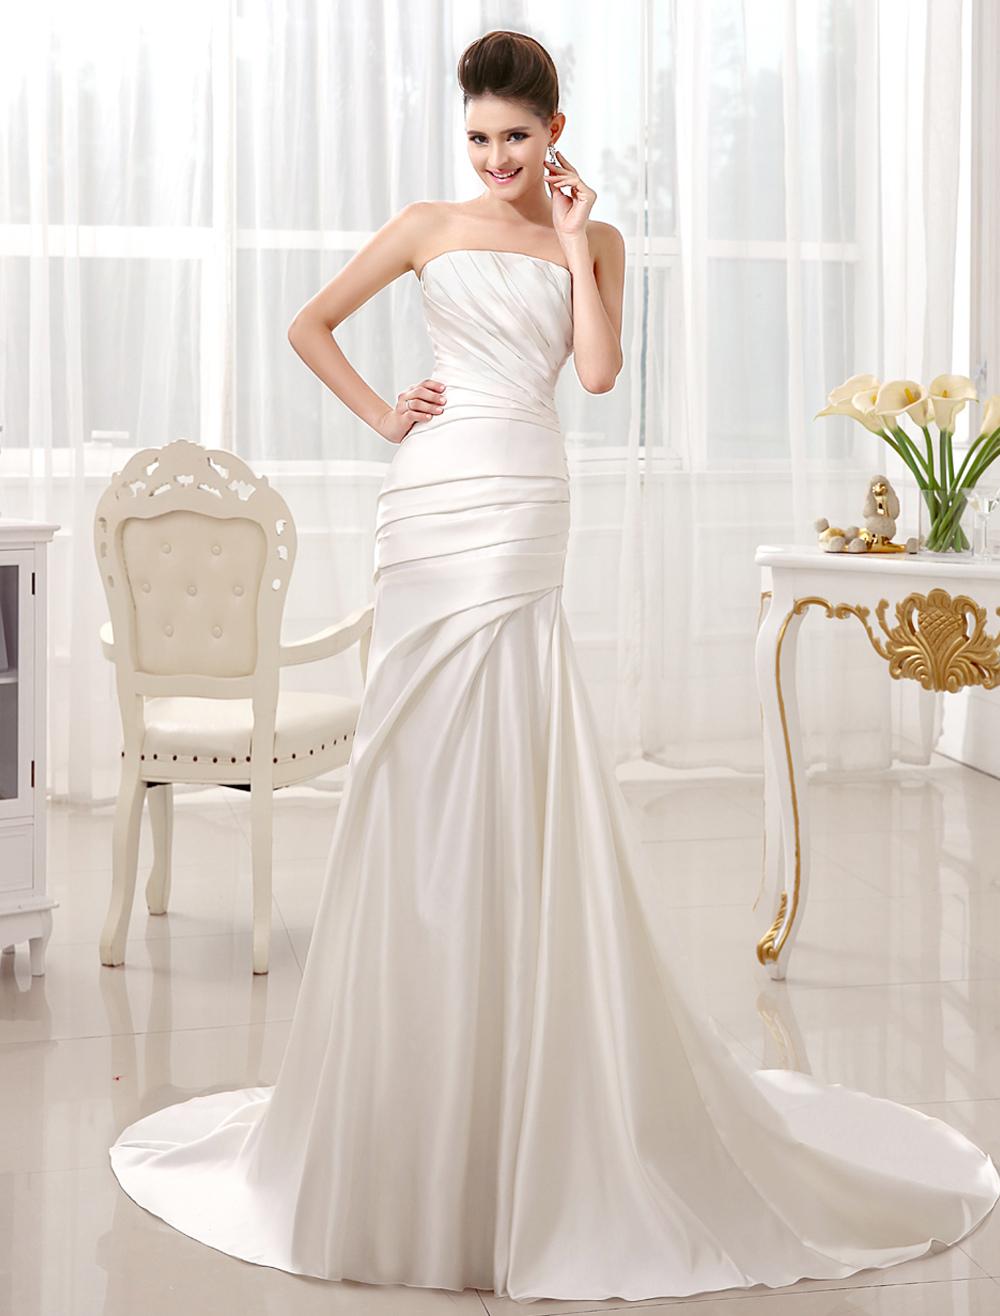 Ivory Mermaid Court Train Bridal Wedding Dress with Strapless